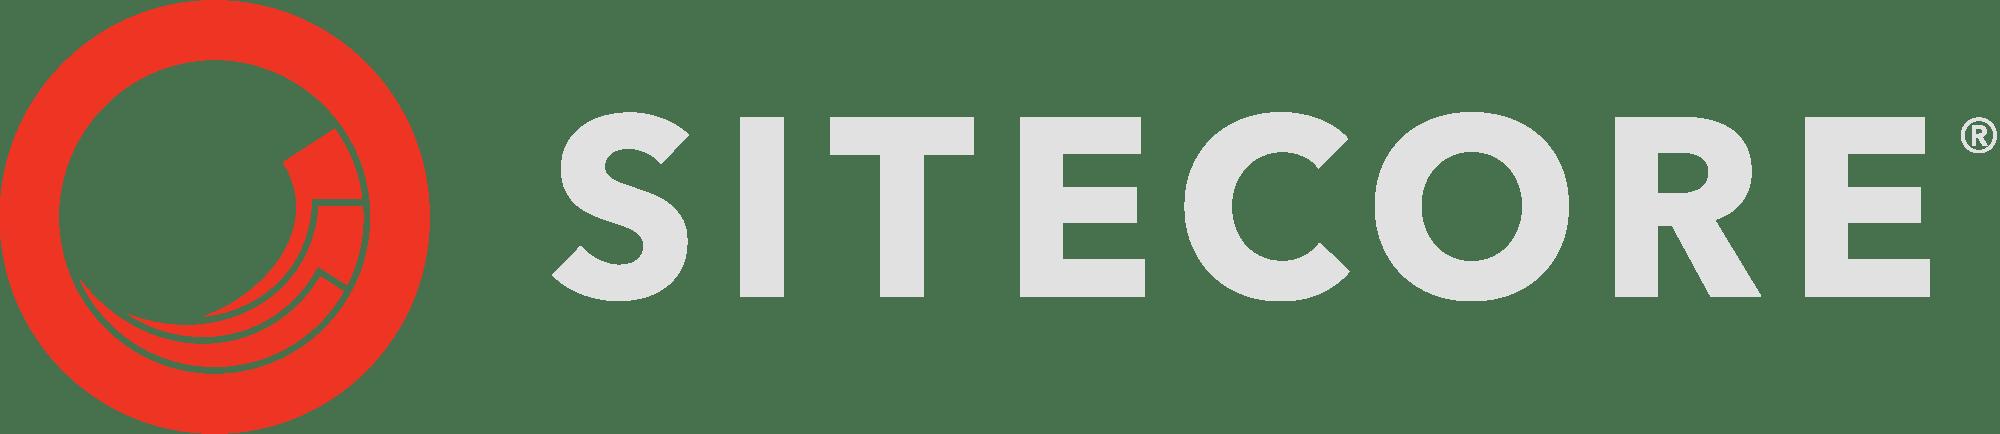 Sitecore Content Hub logo